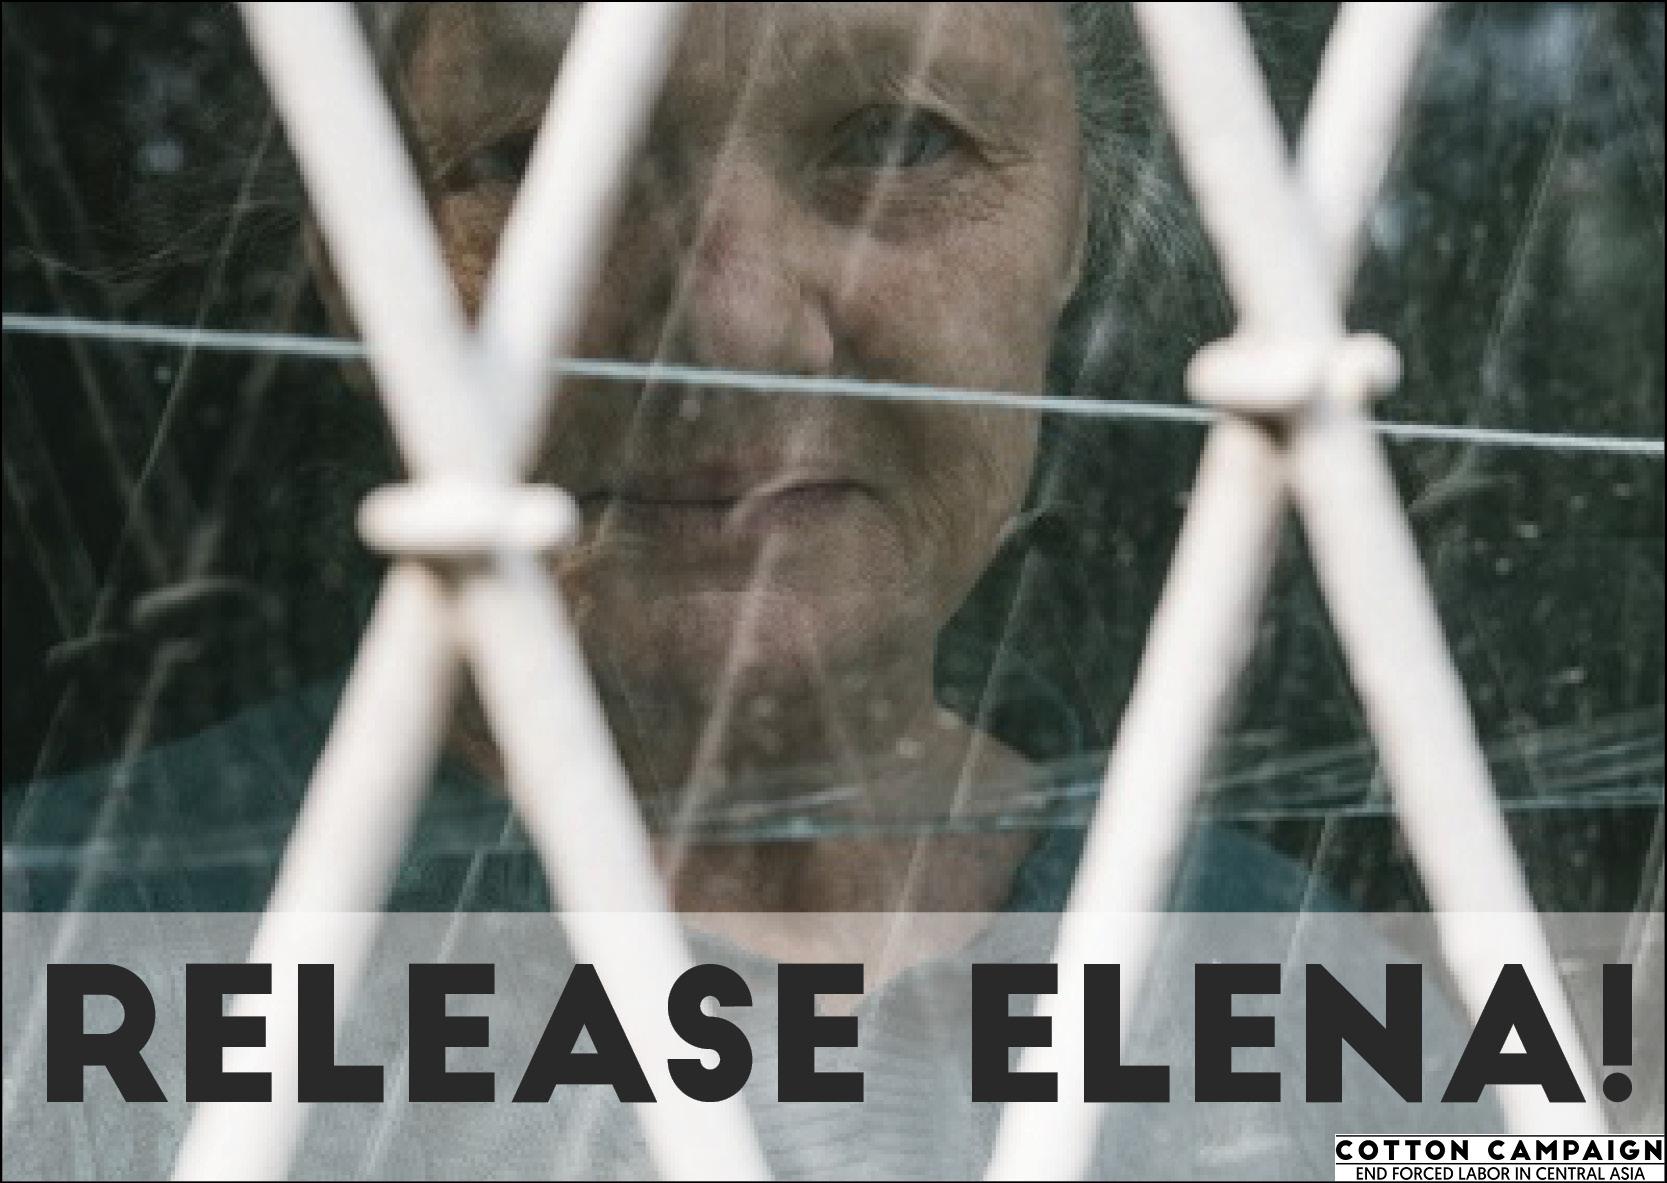 EU Statement on Human Rights defenders Elena Urlaeva and Azam Farmonov